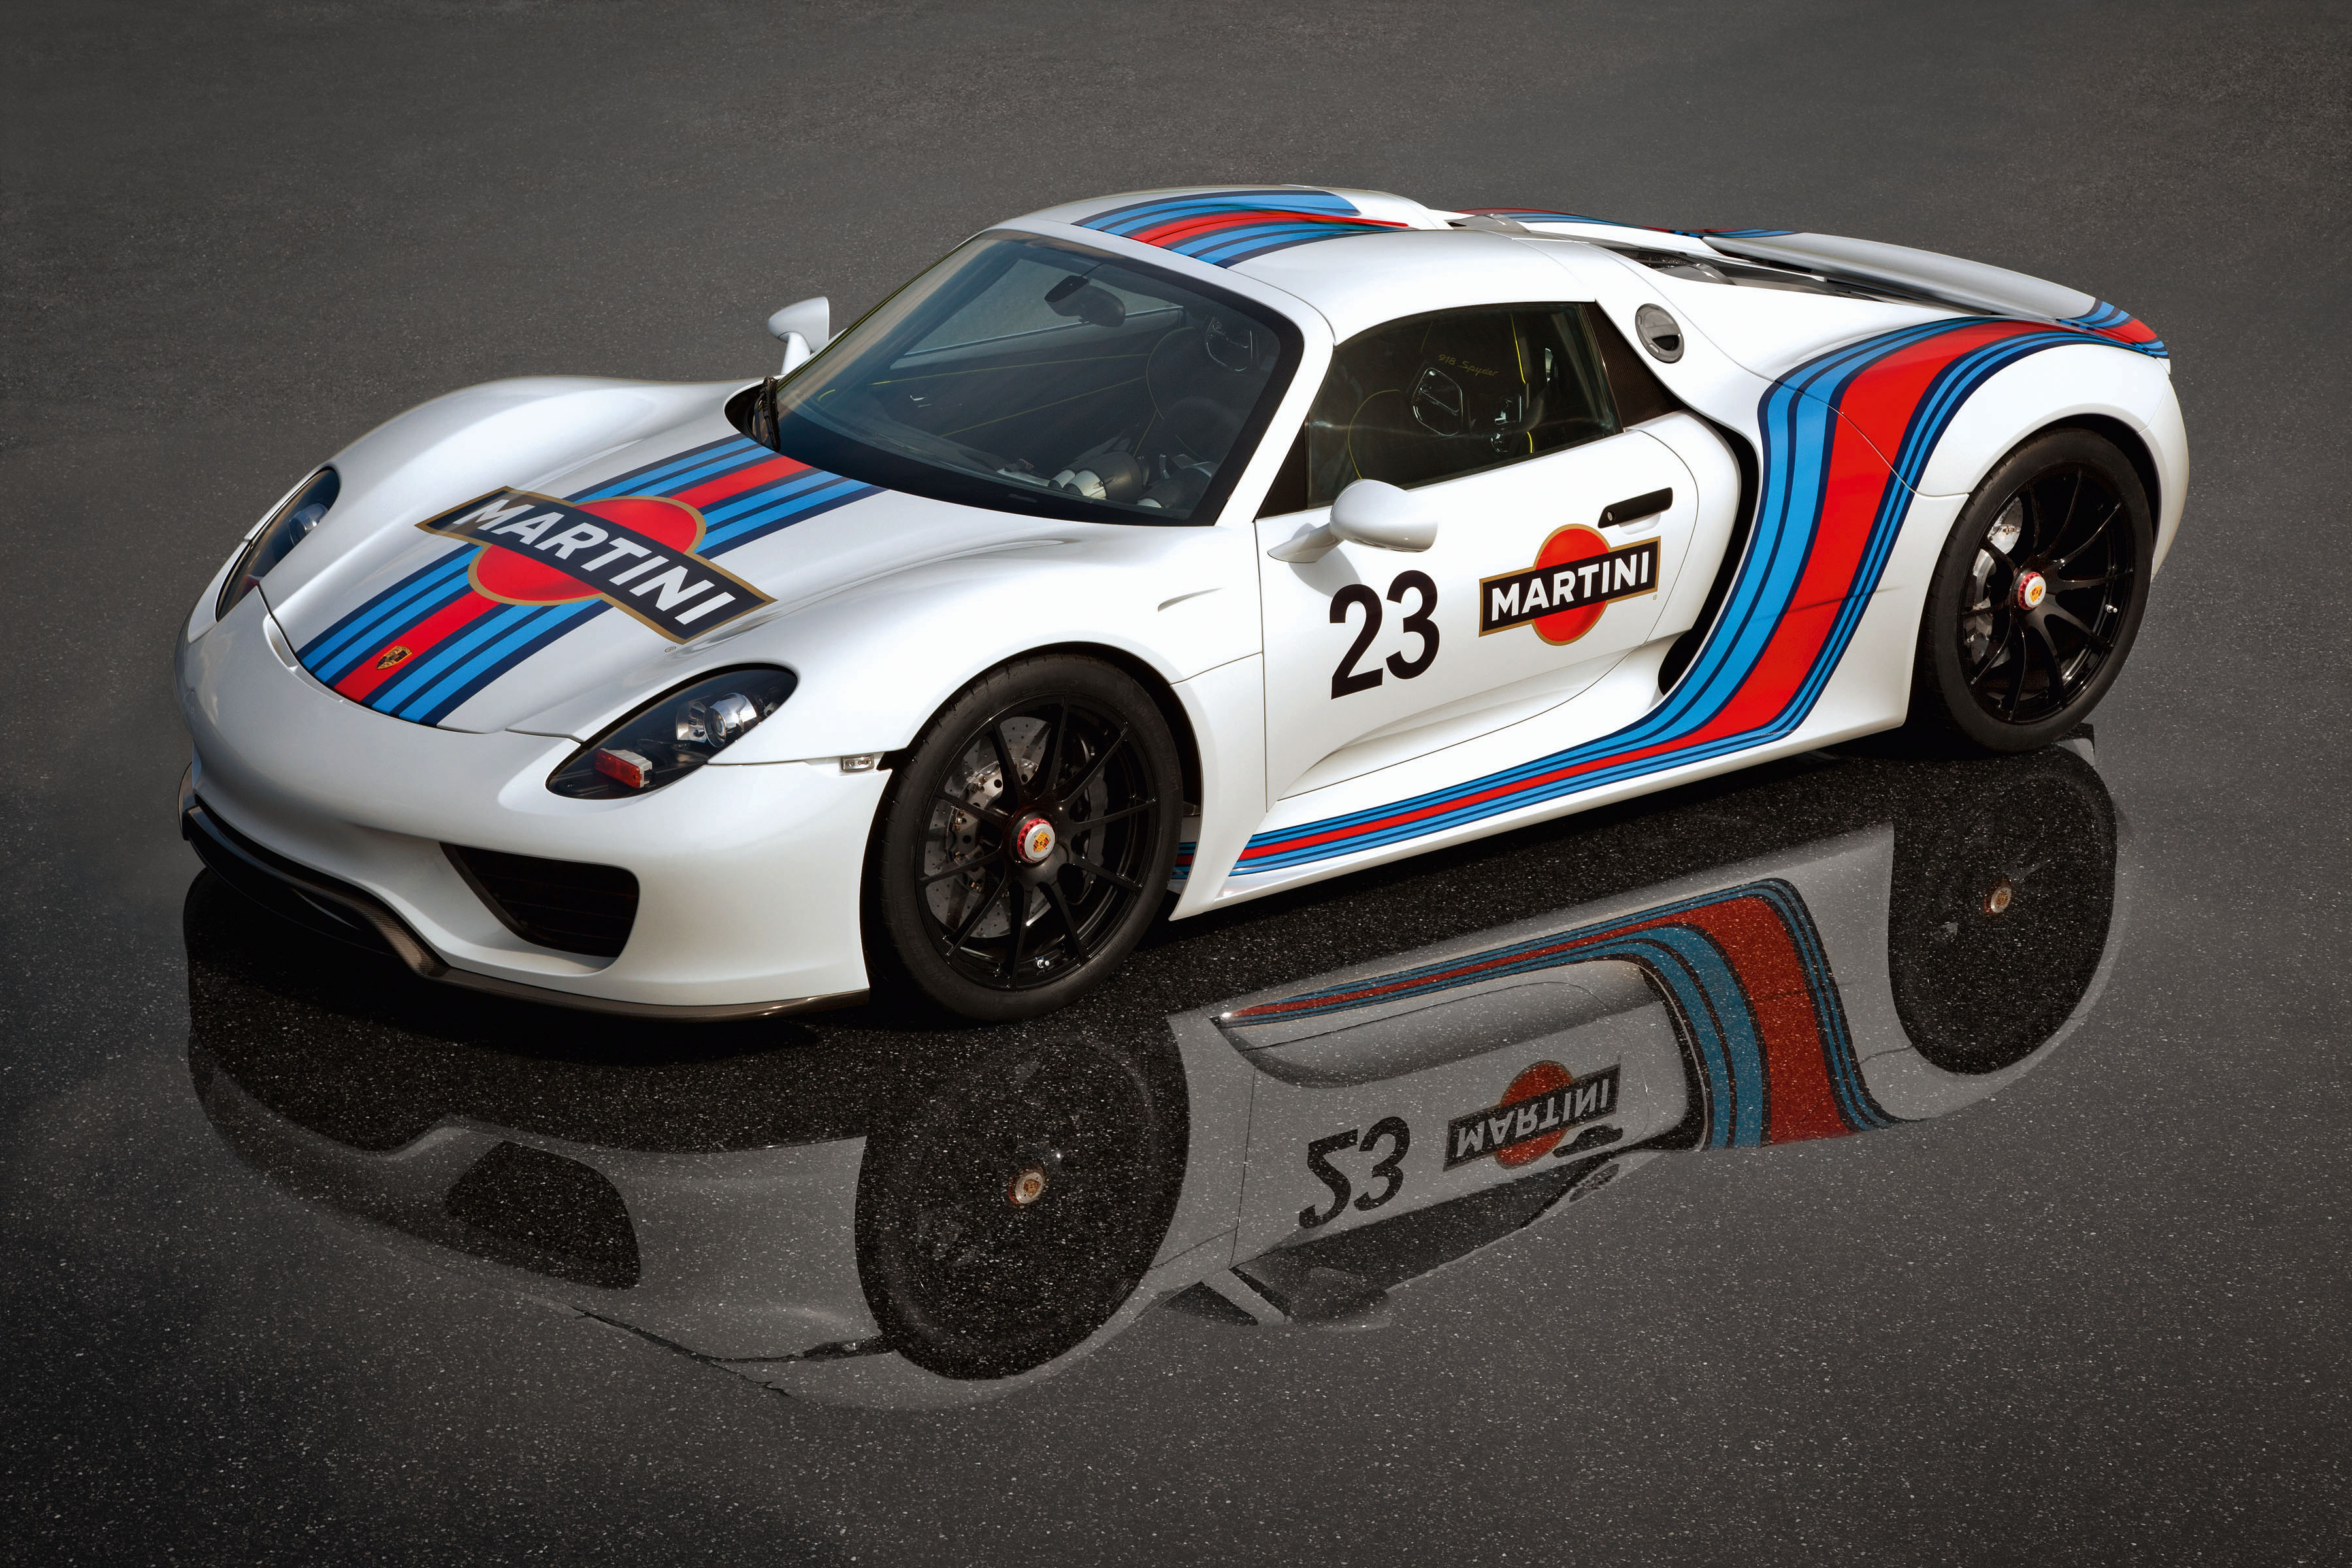 918 Martini front angle 2